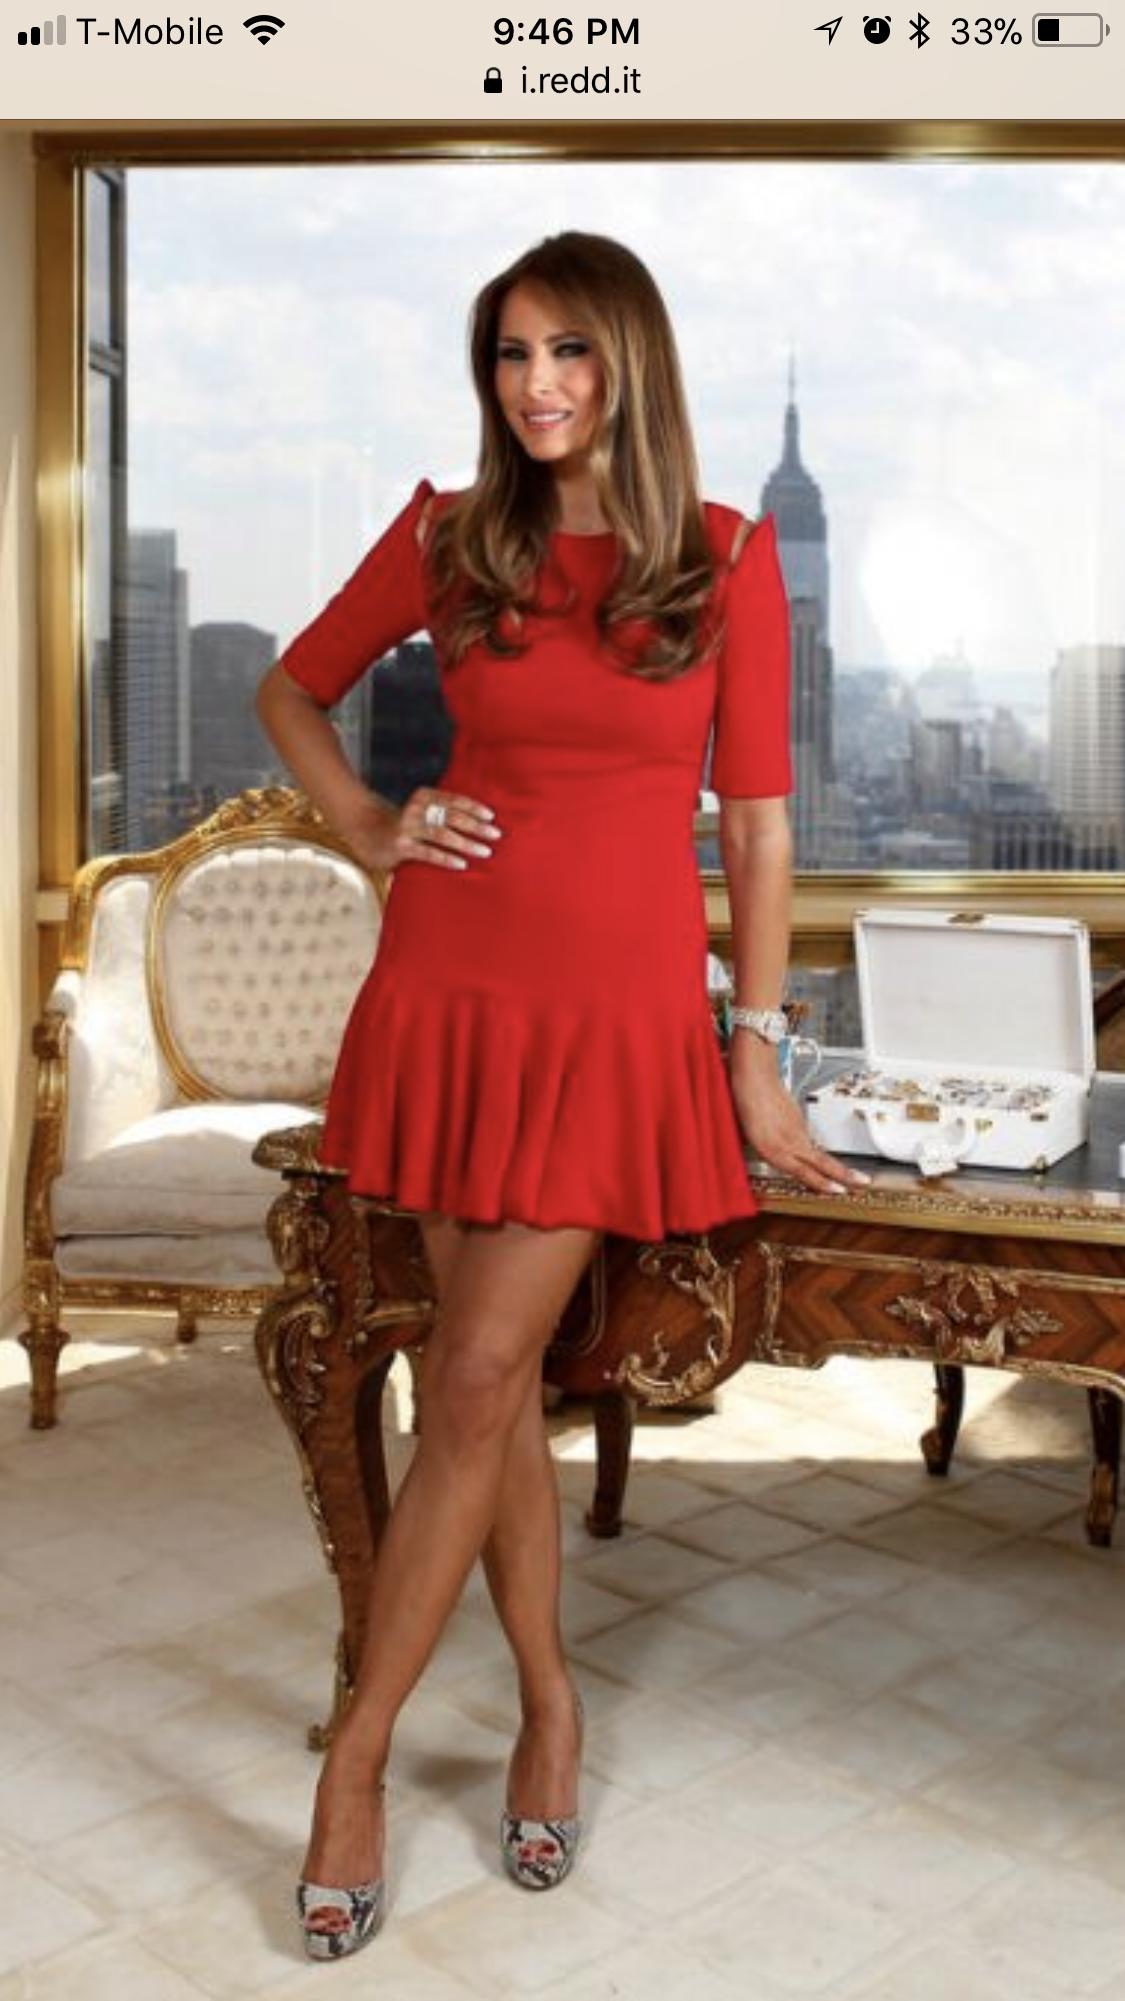 048c036defb Melania Trump. FLOTUS perfection.  trump  firstlady  melania  FLOTUS   beautiful  beauty